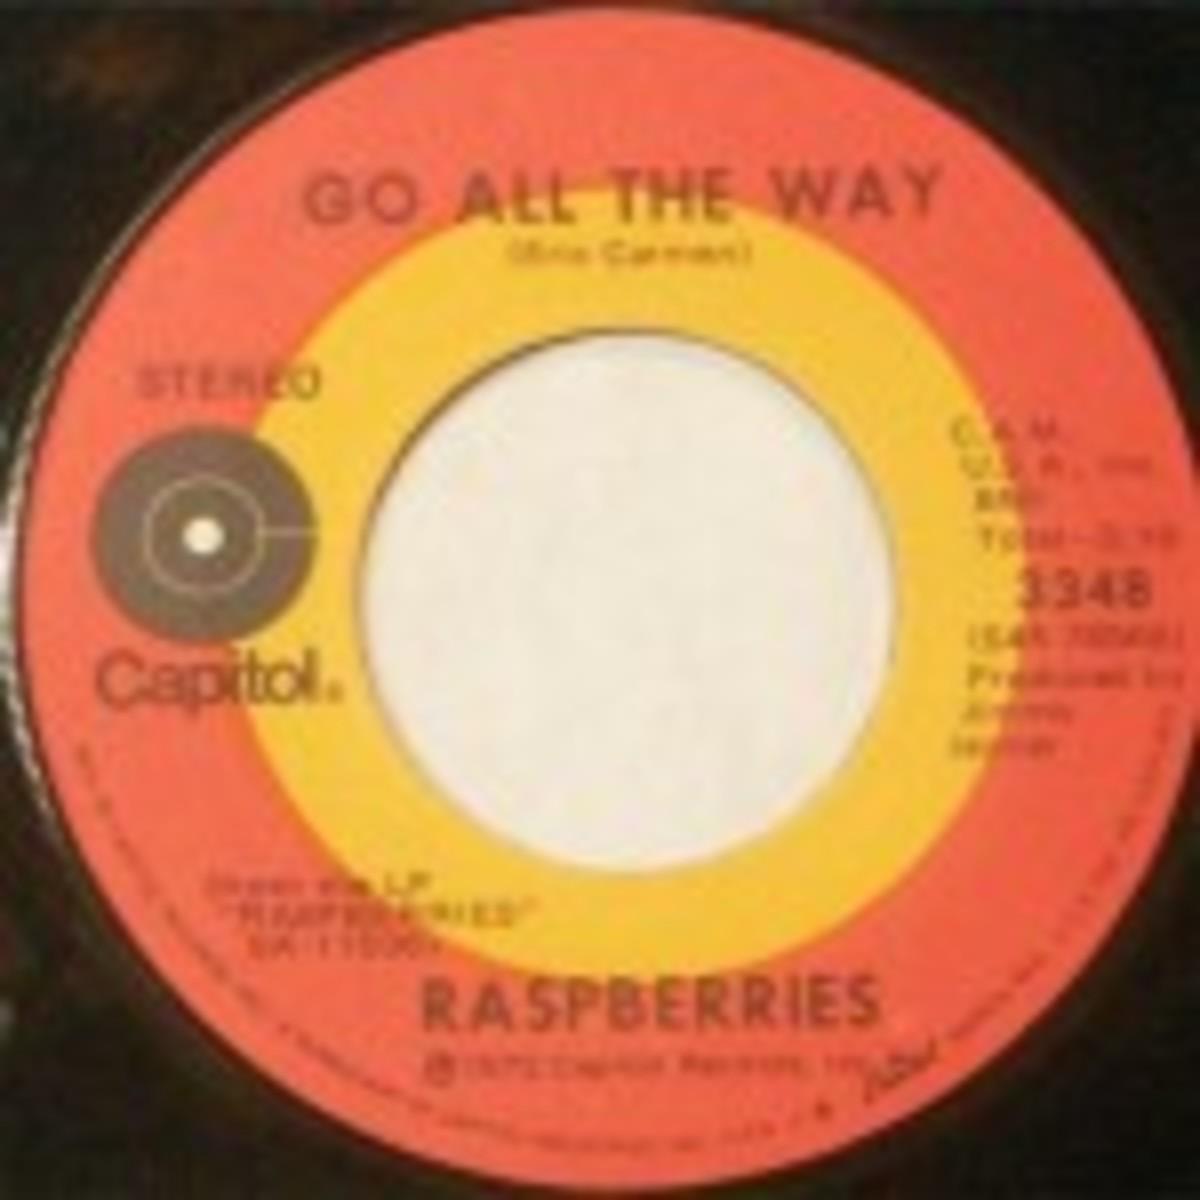 Raspberries_GoAllTheWay